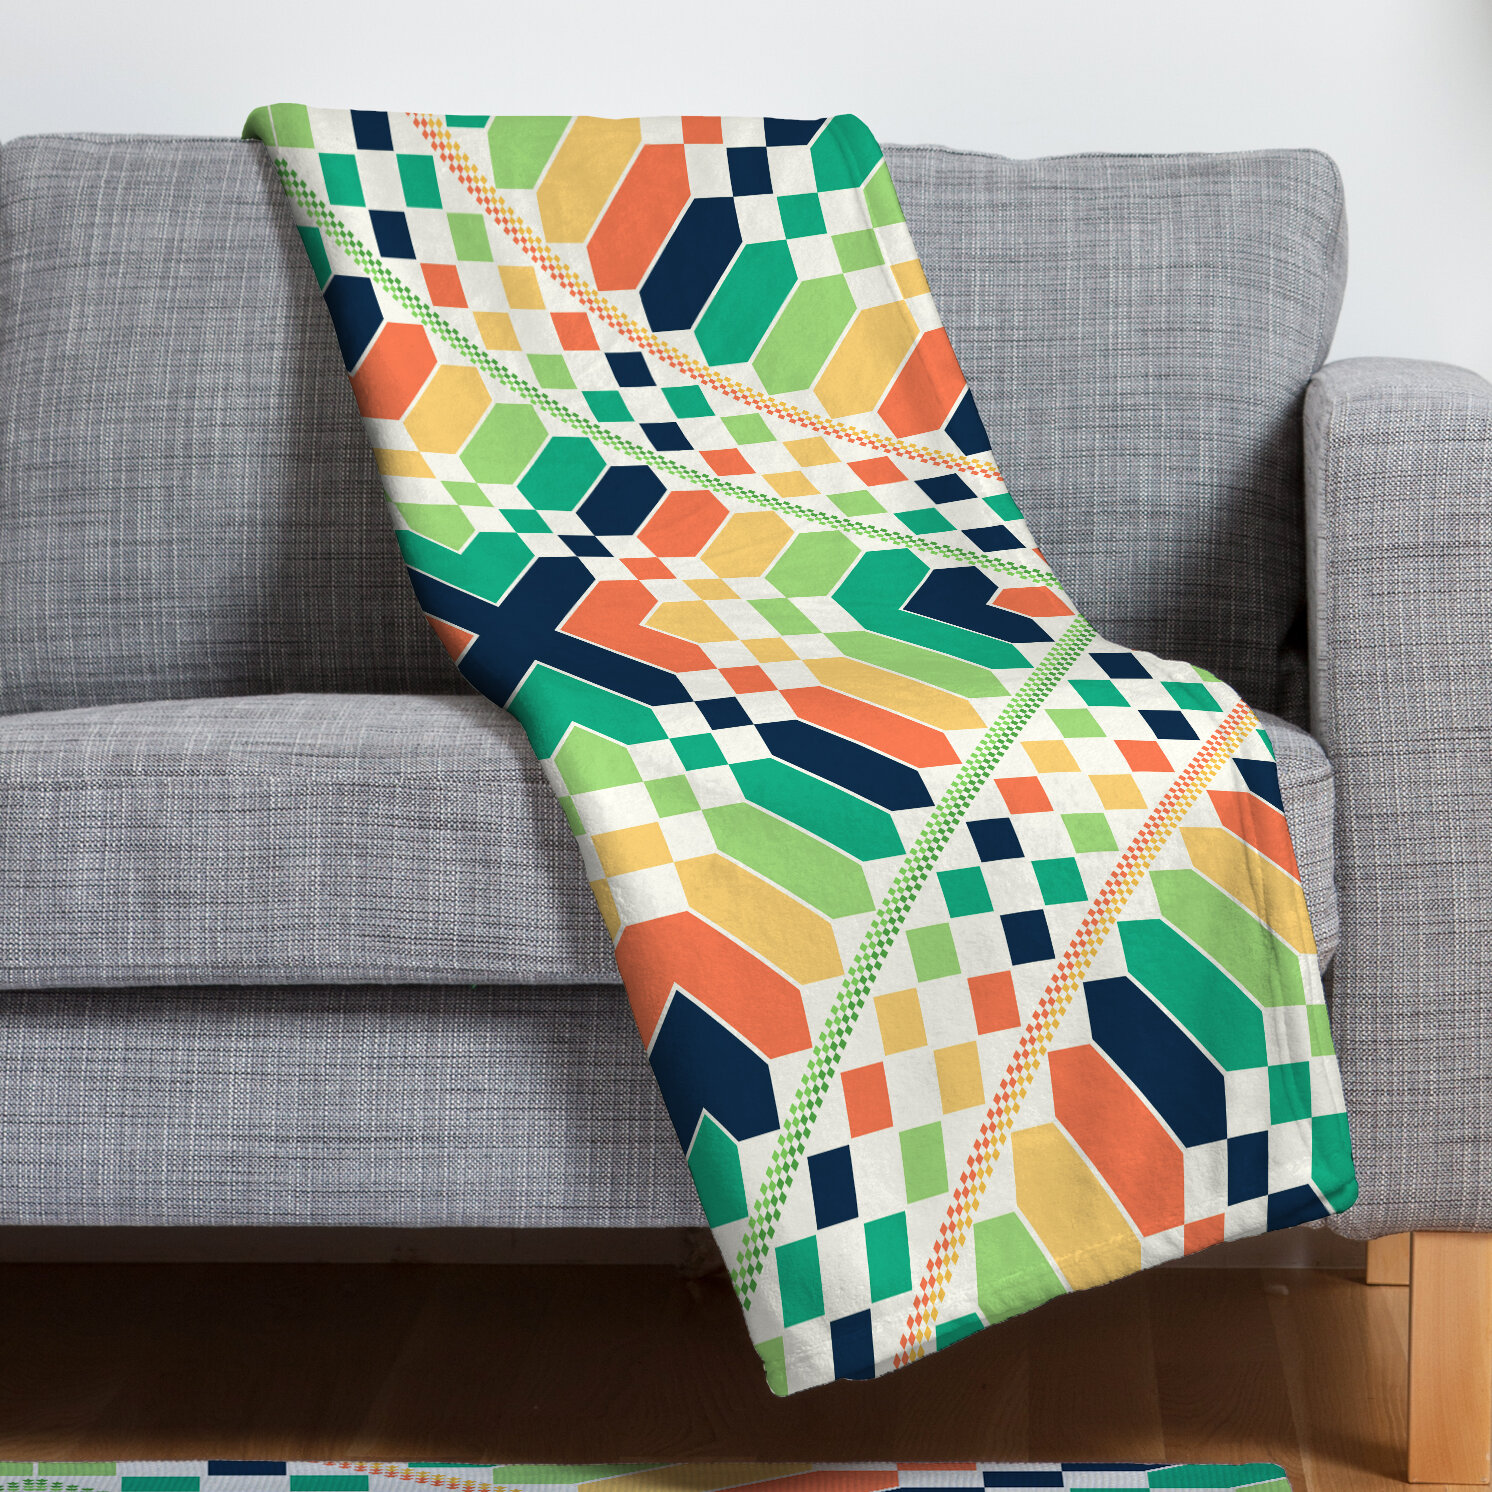 East Urban Home Retrographic Fleece Blanket  645dffa63